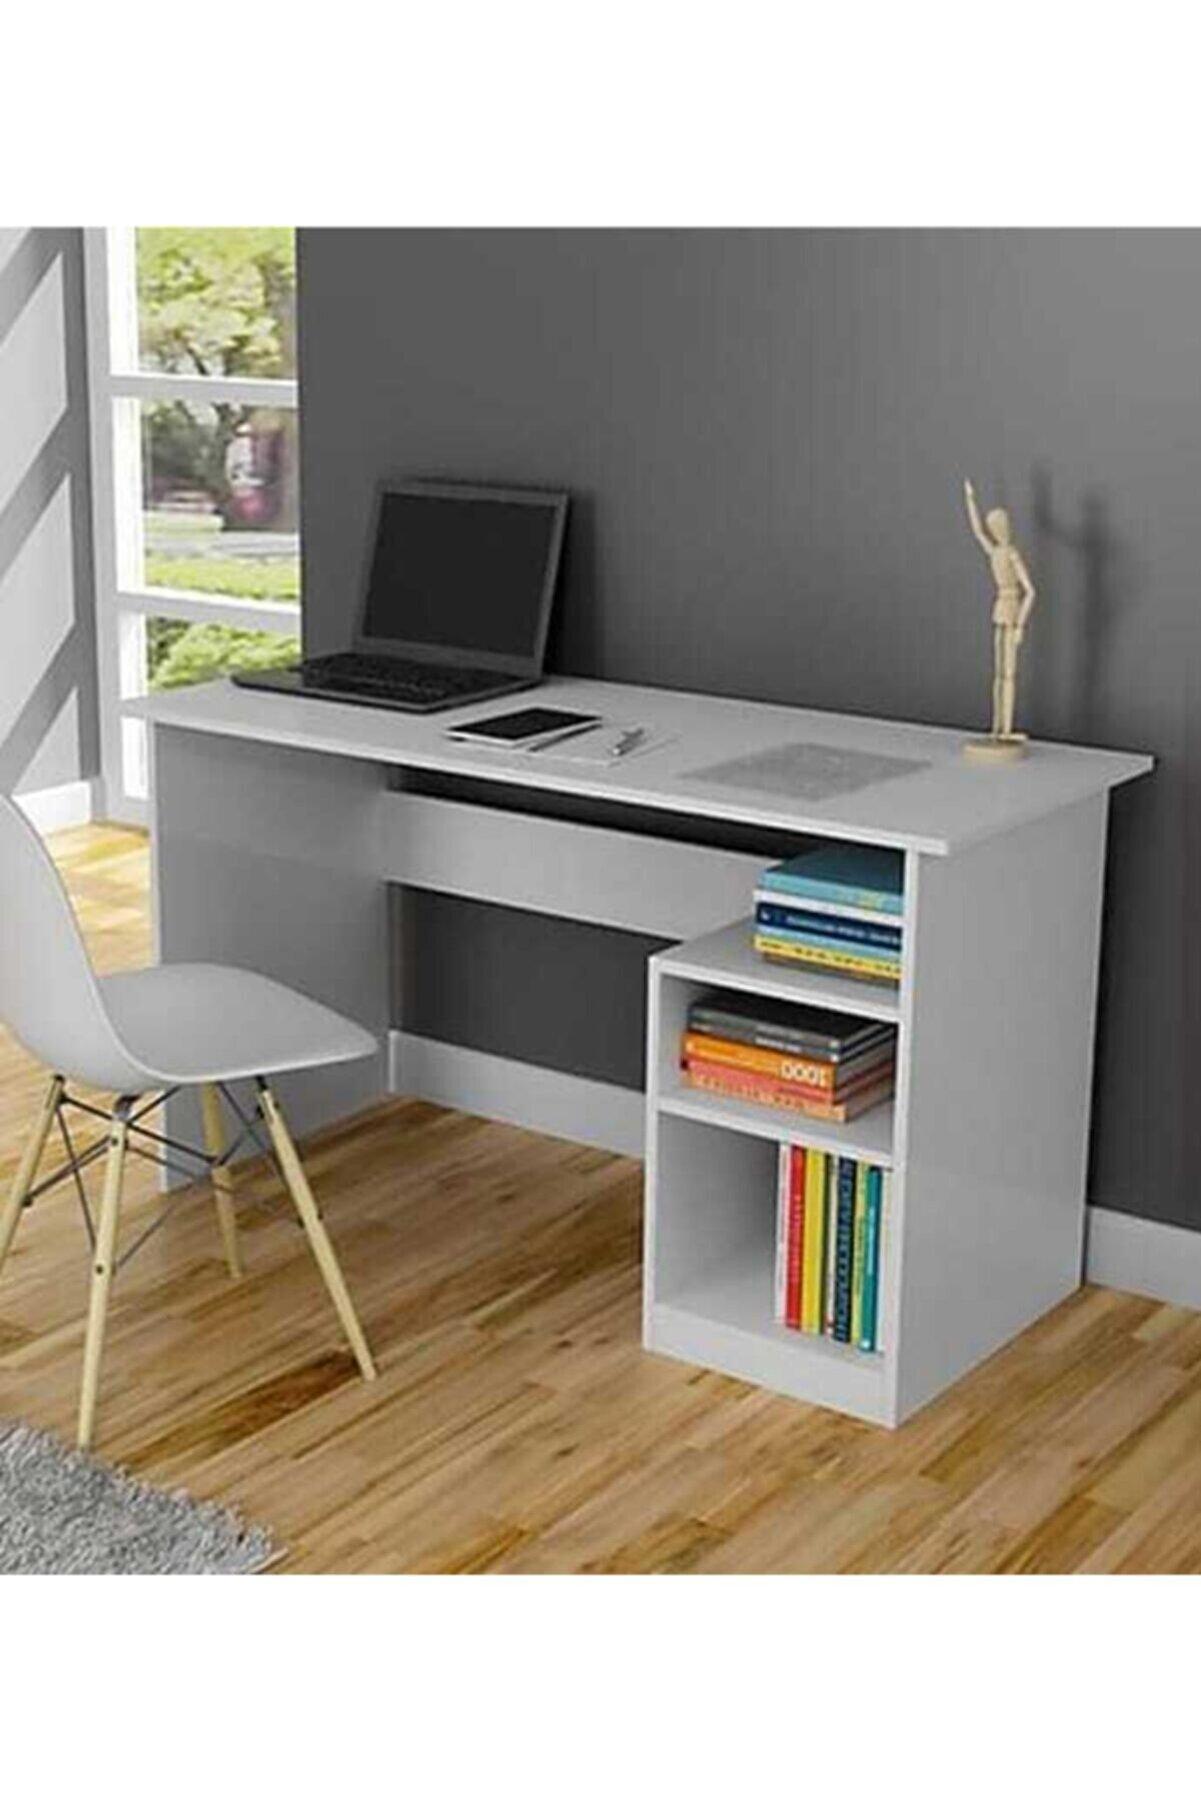 gtaş mobilya Çalışma Msası Bilgisayar Masası Ofis Masası